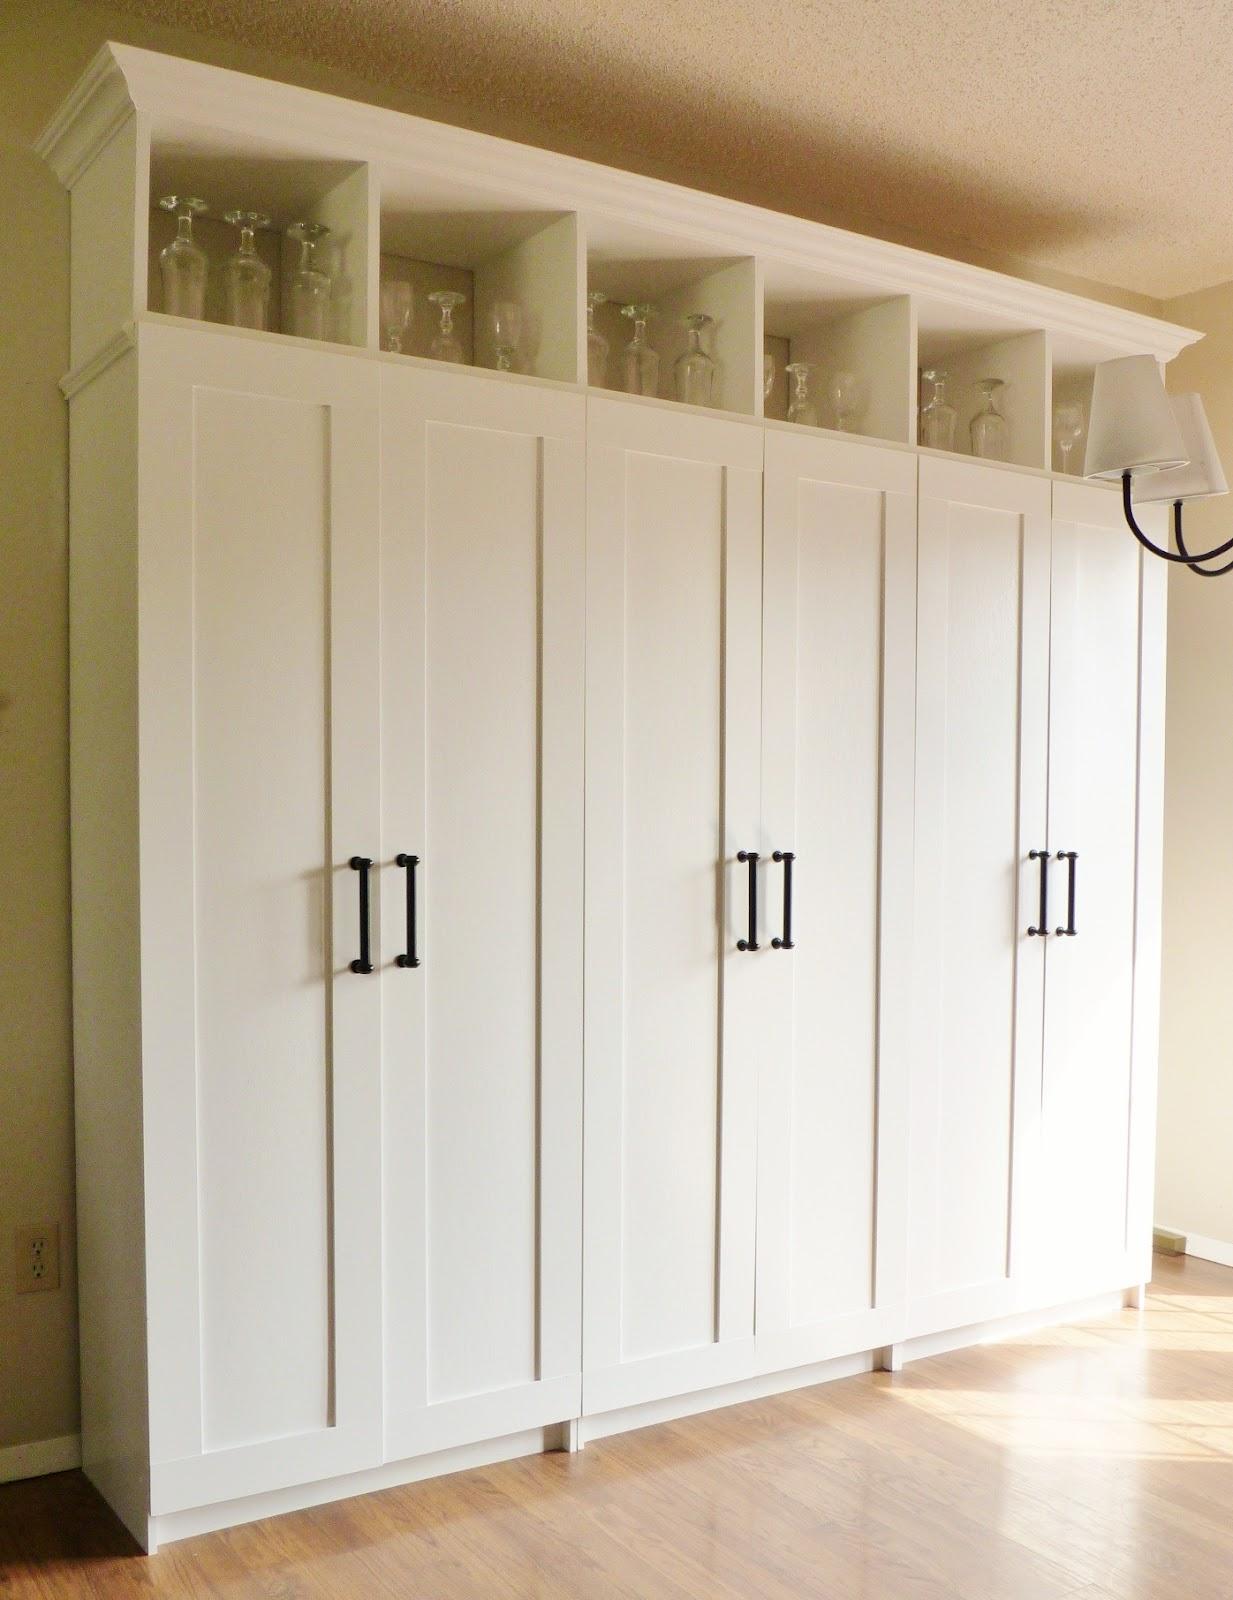 d i y d e s i g n KindaCustom Storage Cabinet